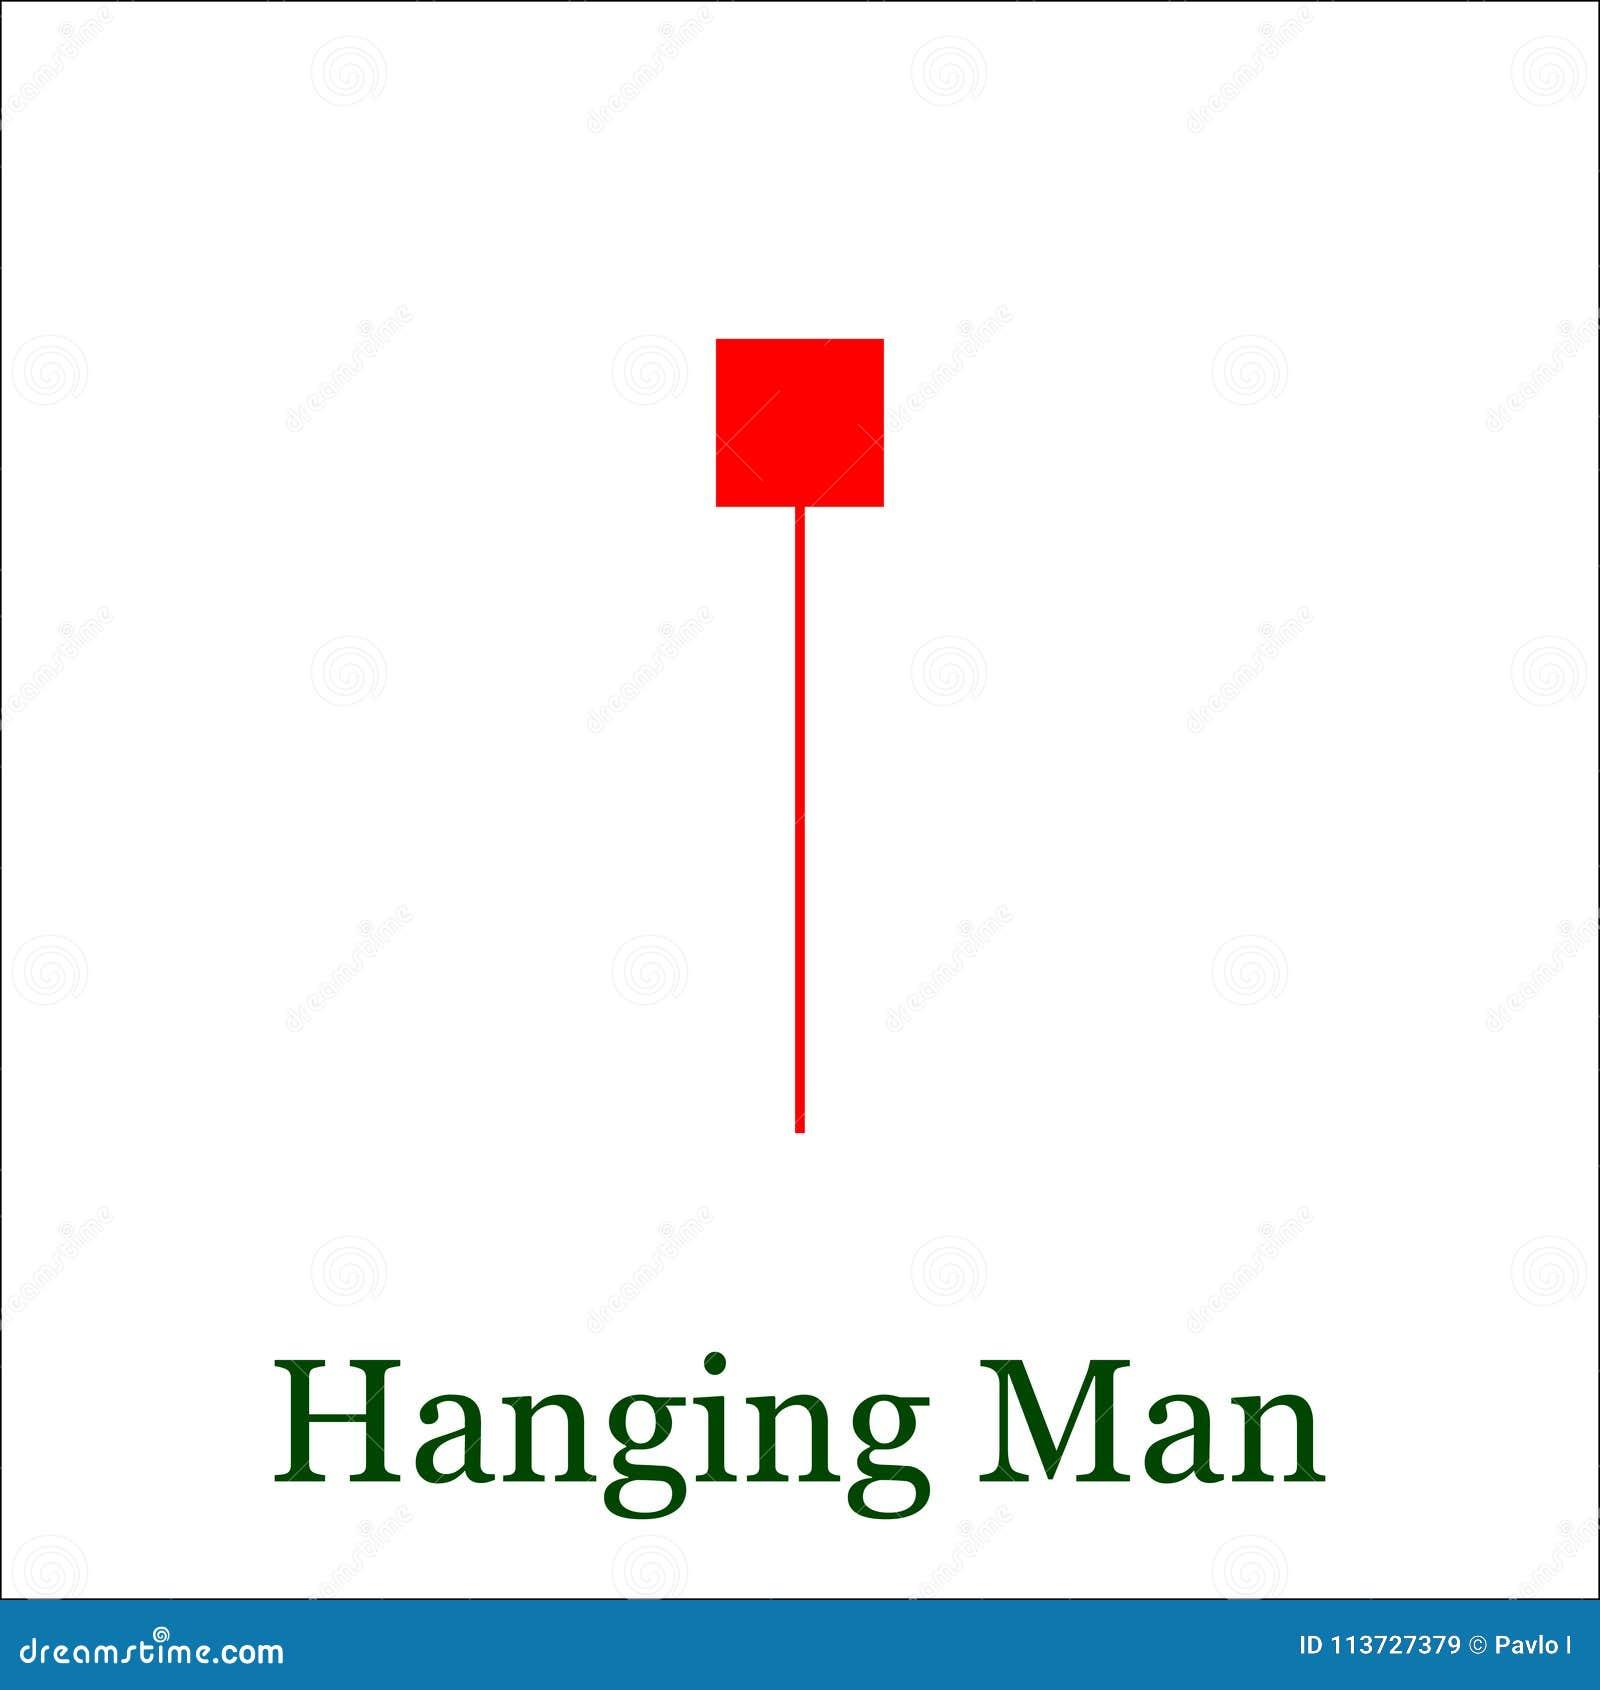 hanging man candlestick chart pattern set of candle stick cand